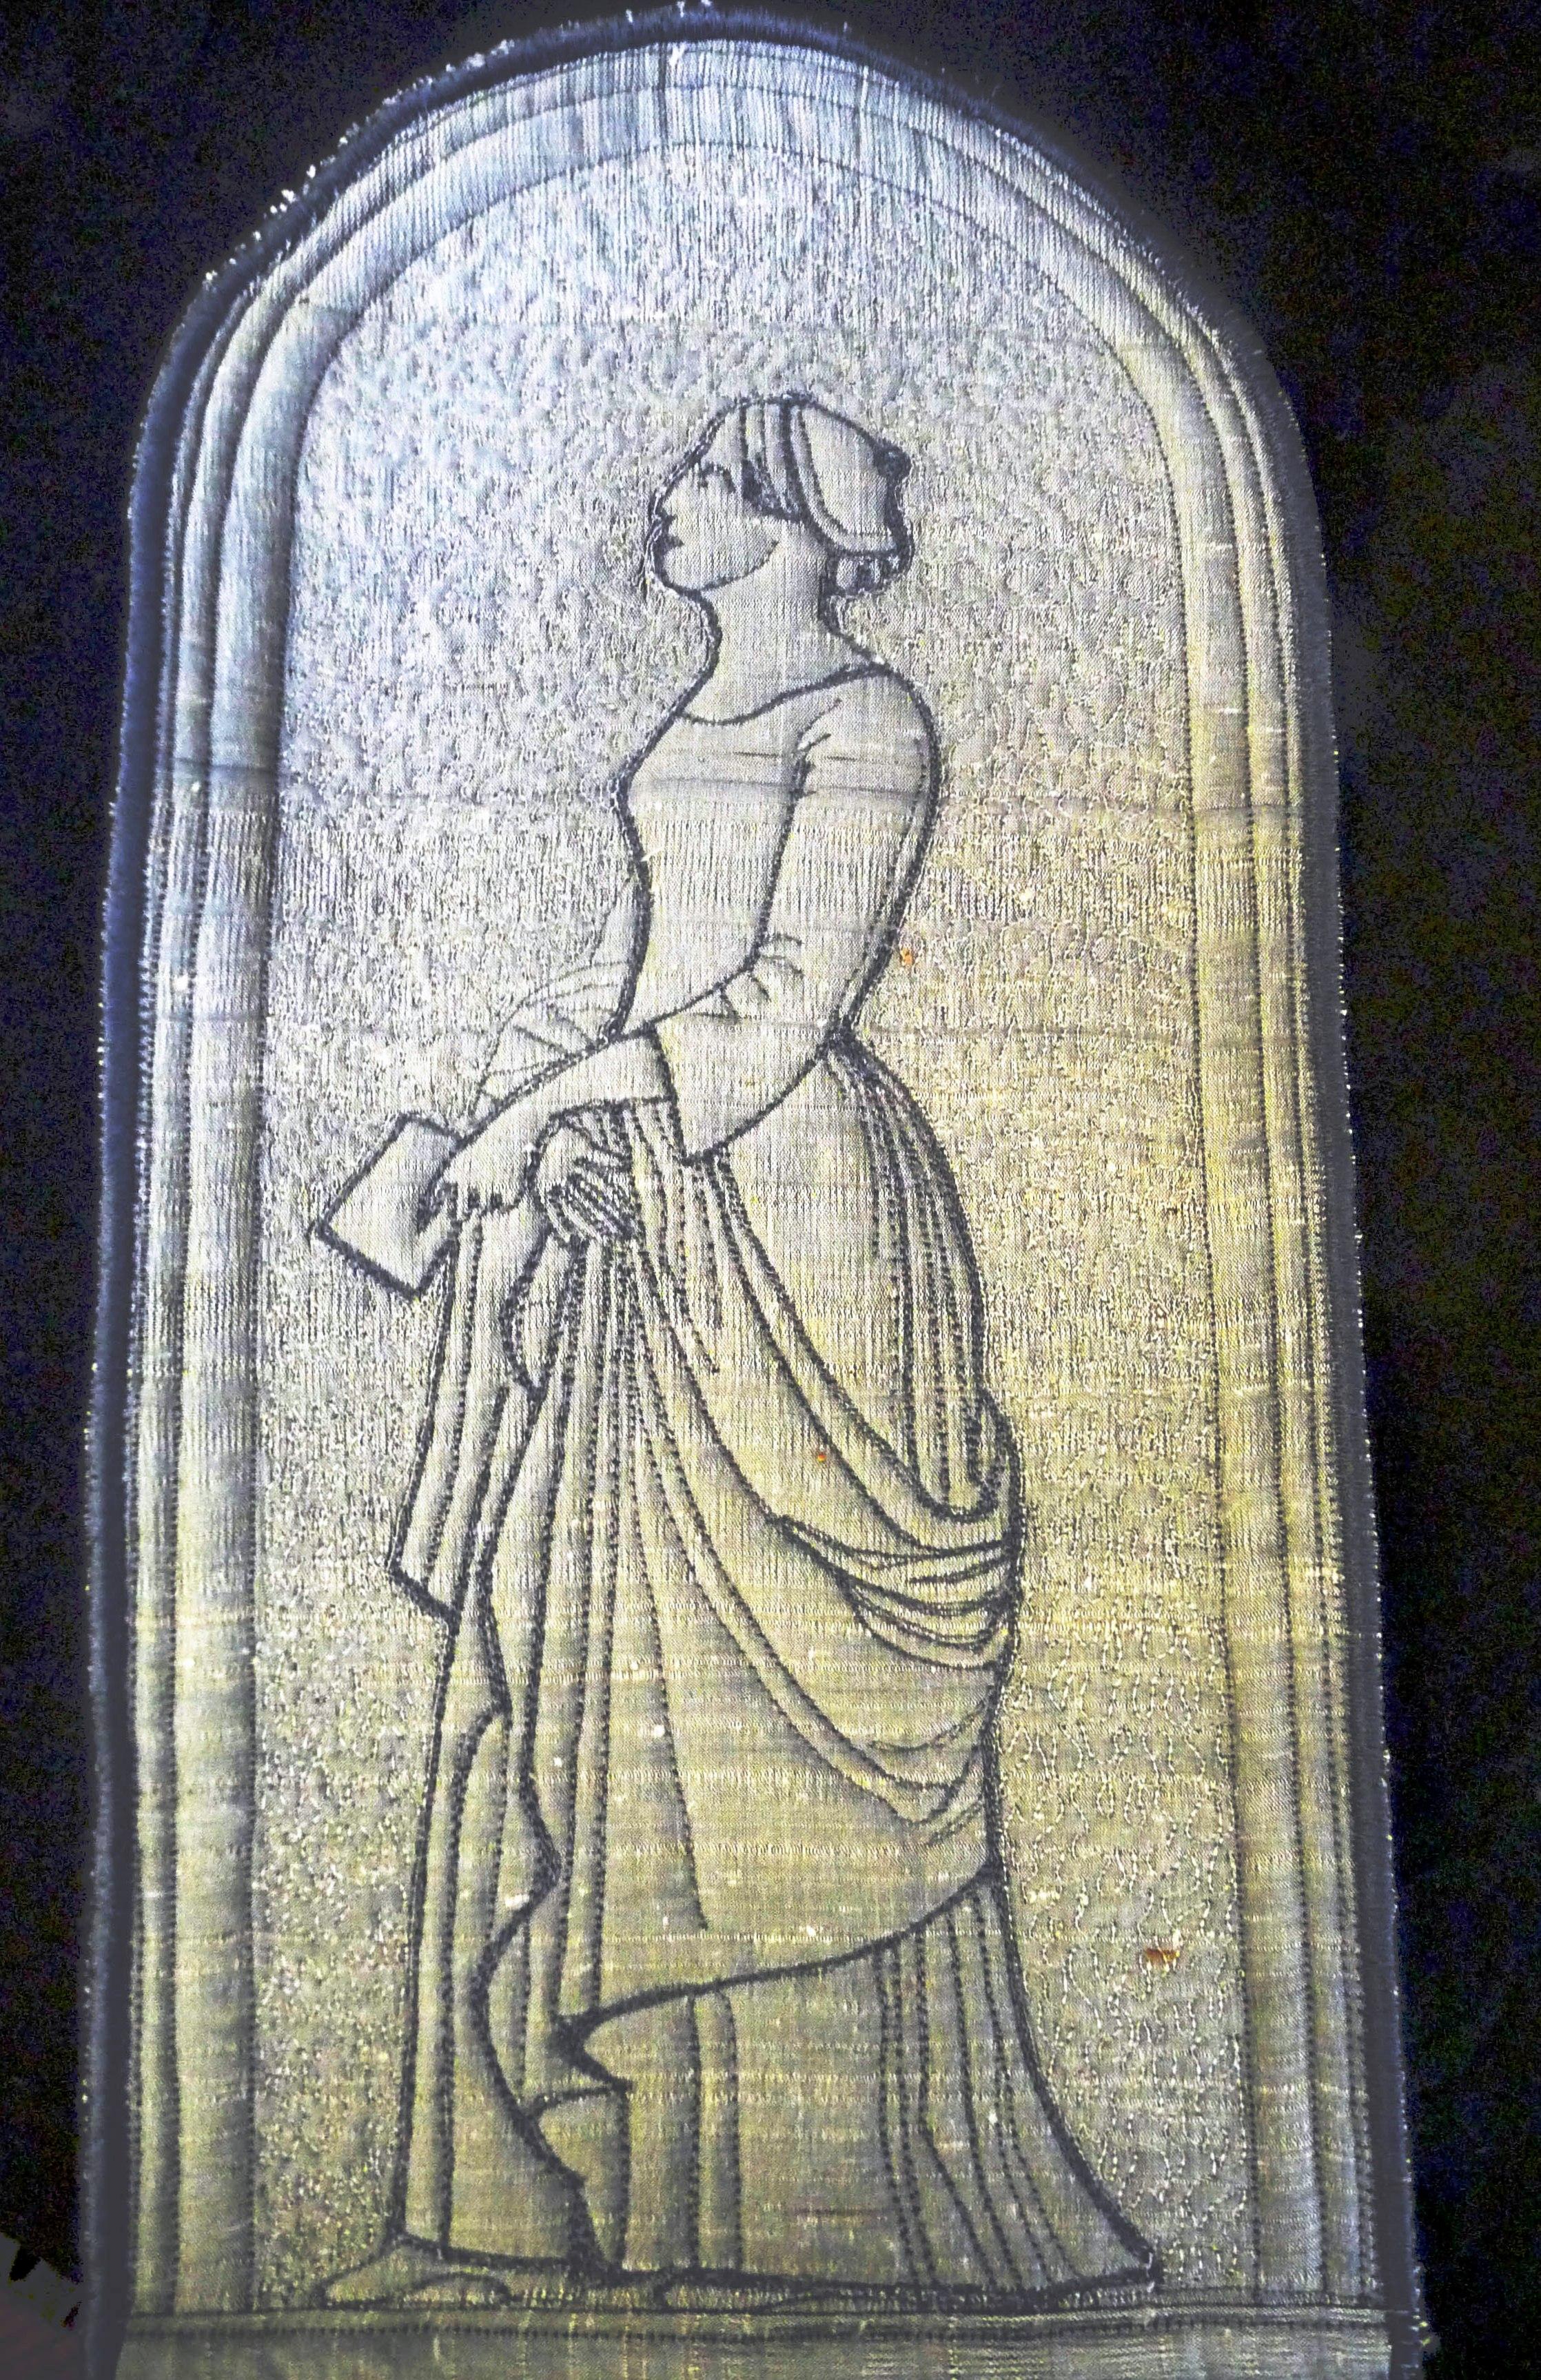 embroidery by Moya McCarthy